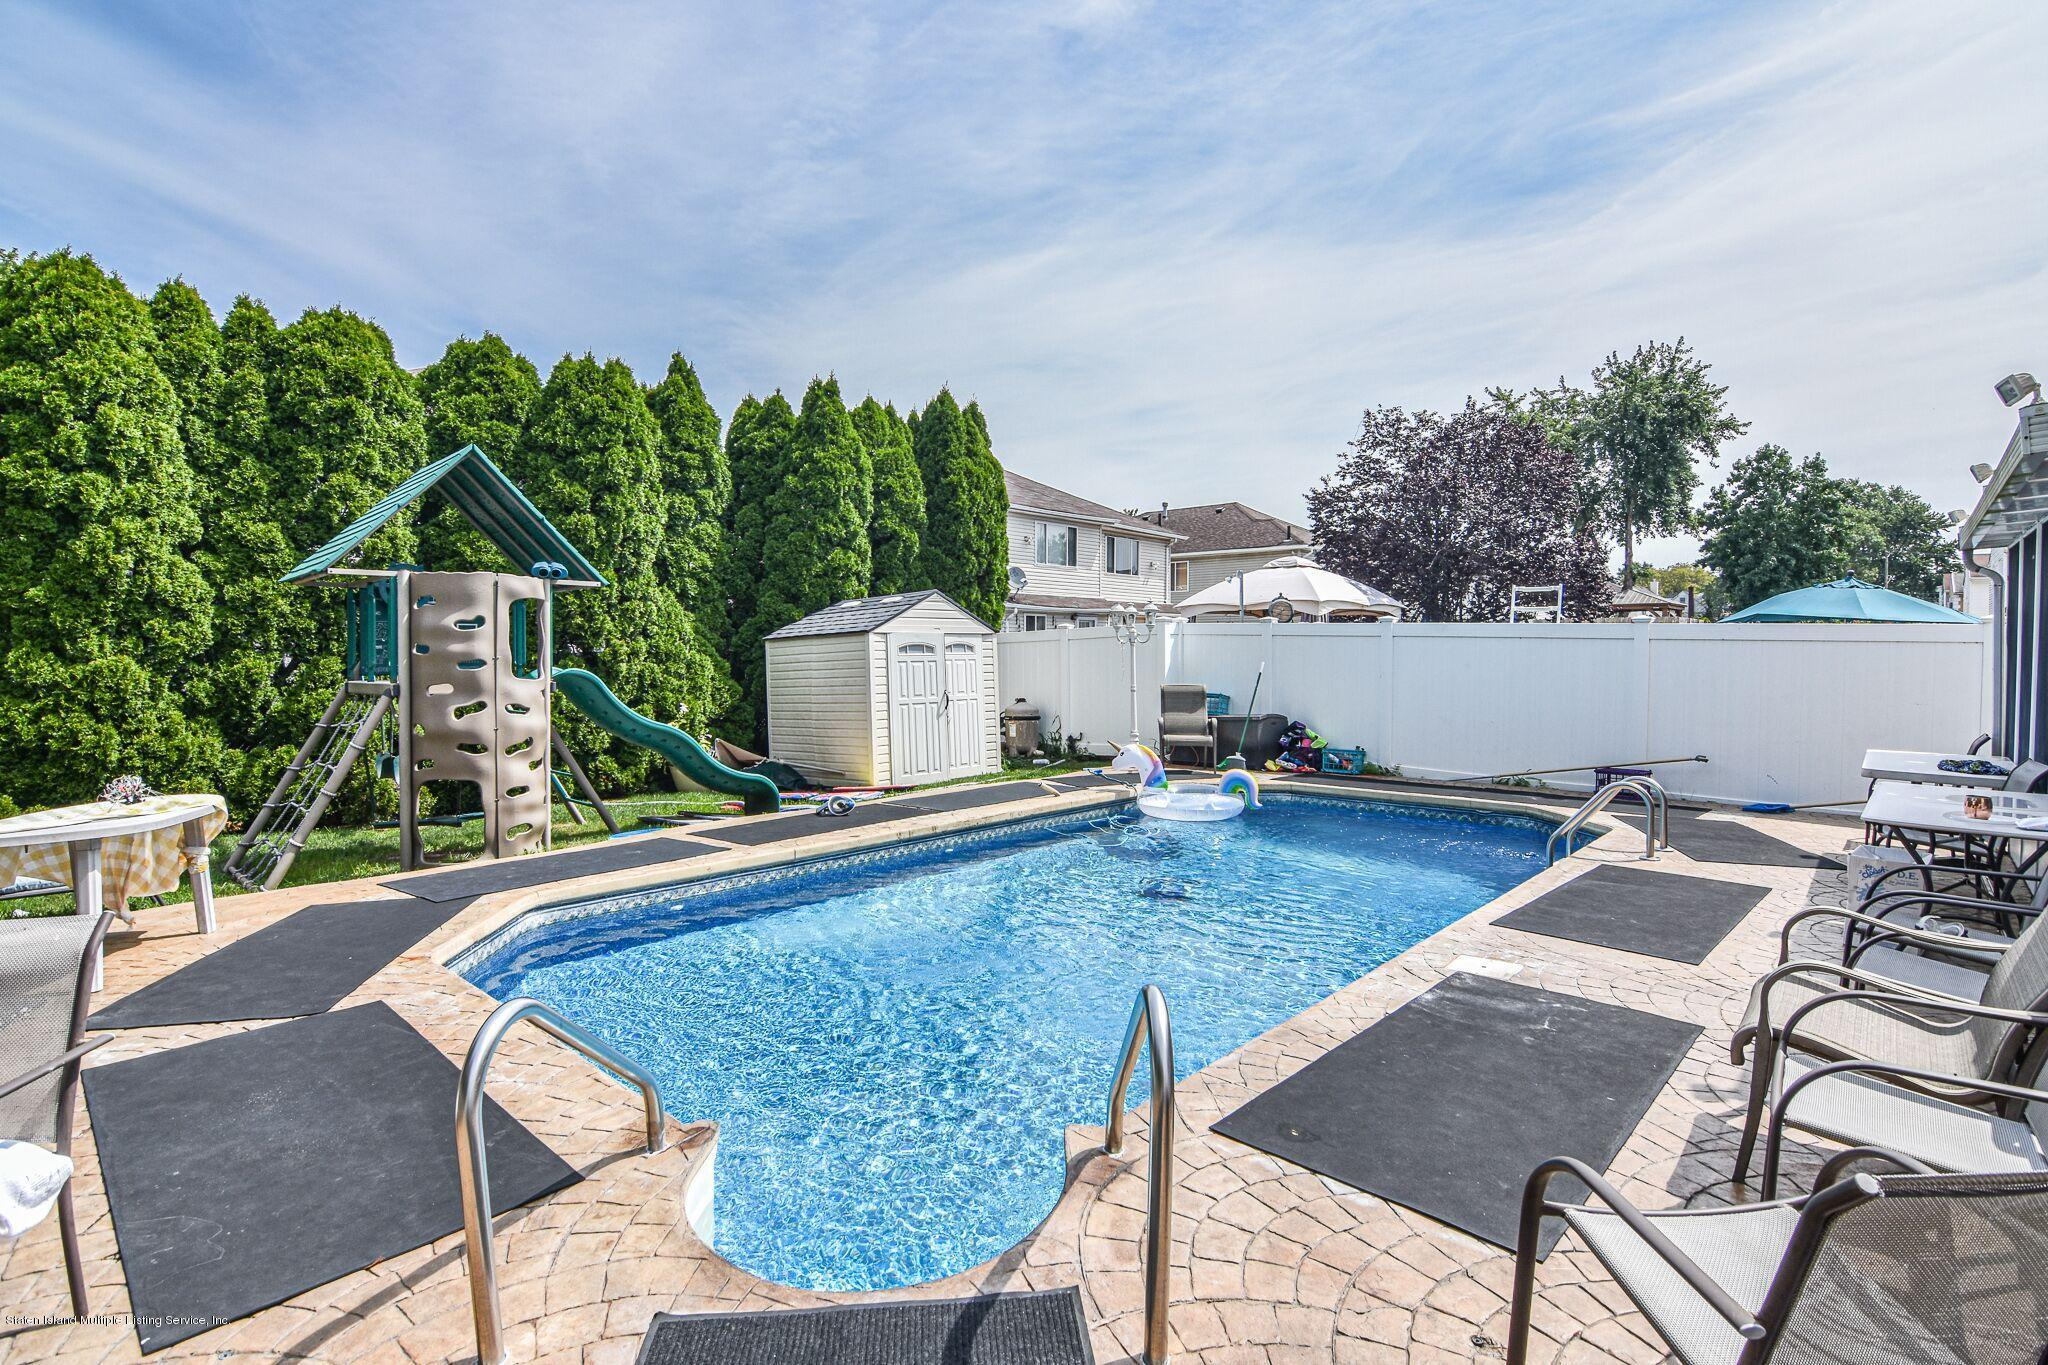 Two Family - Detached 3 Fieldstone Road  Staten Island, NY 10314, MLS-1131141-32